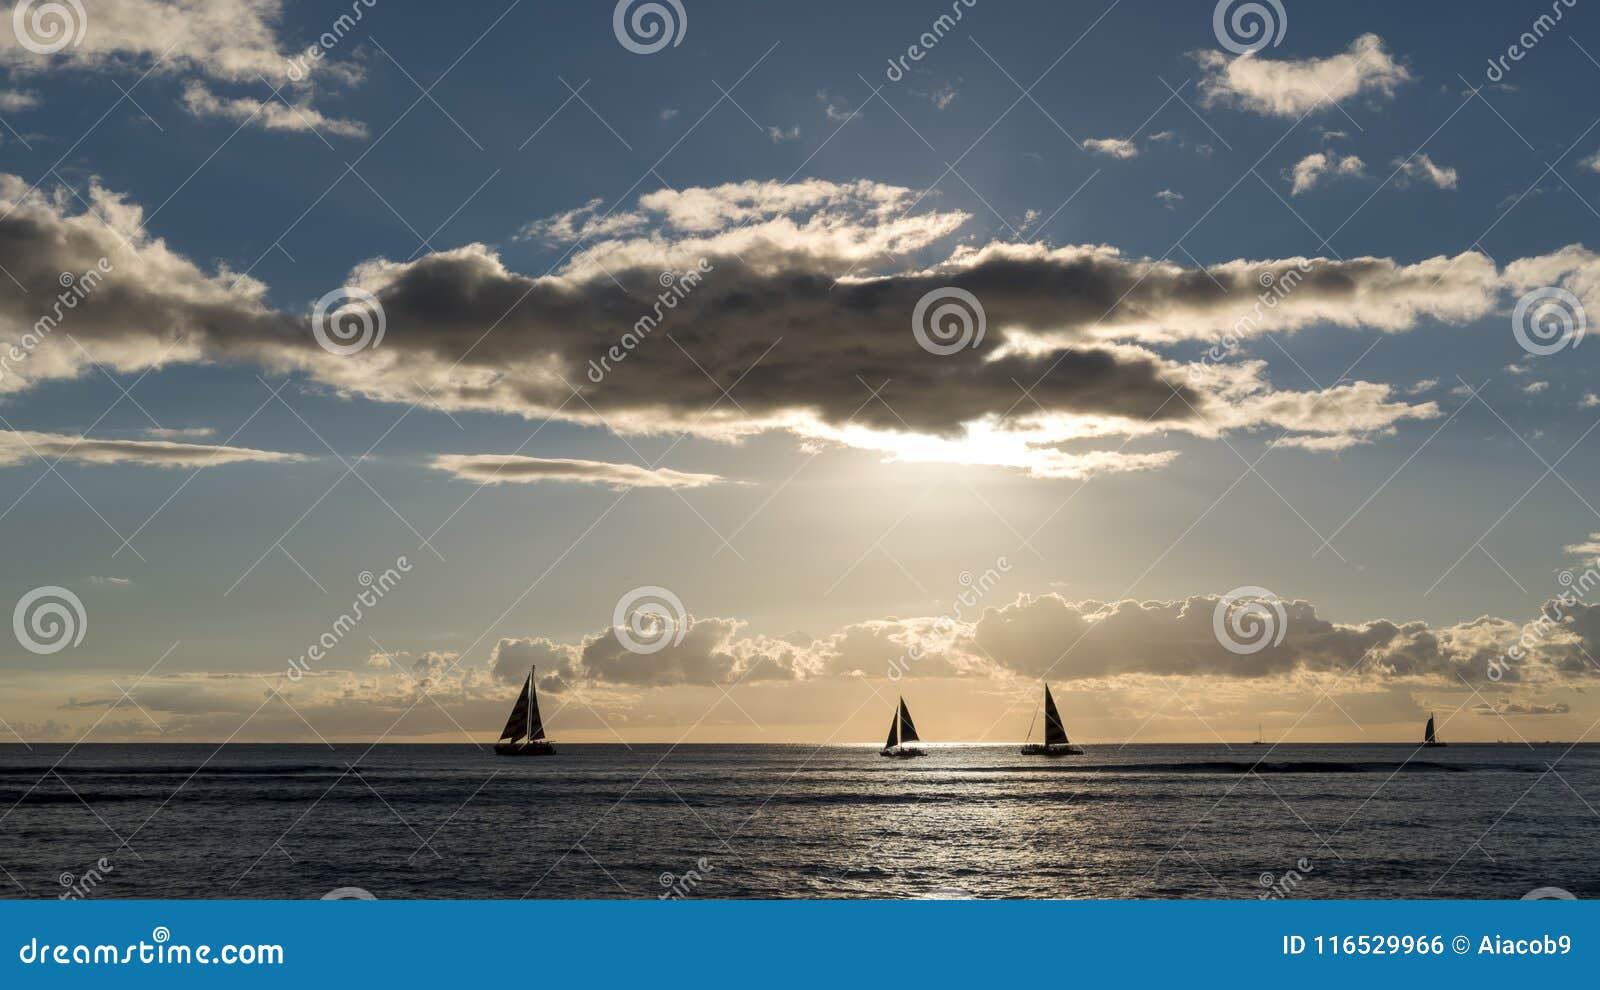 Silhouetted floating sailing boats at the sunset at Waikiki beach, Honolulu, Oahu island, Hawaii, USA